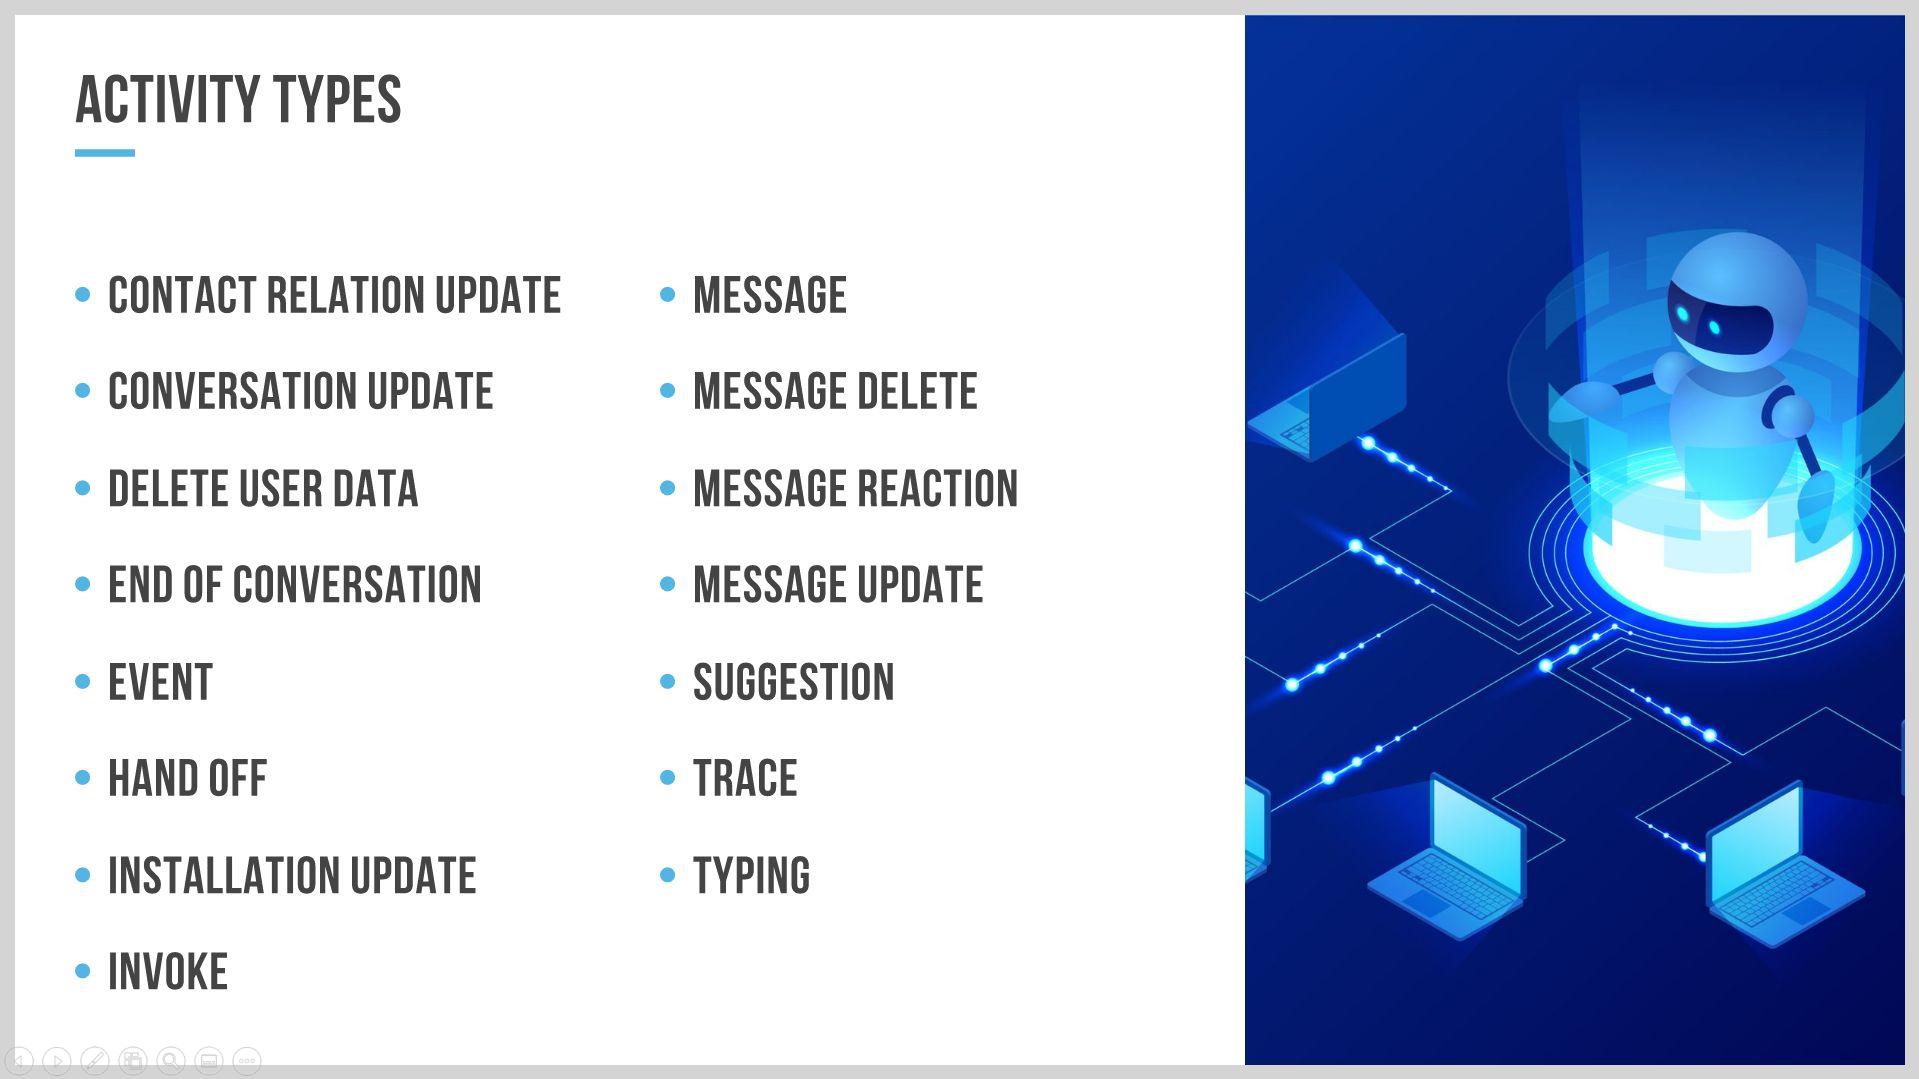 Bot activity types